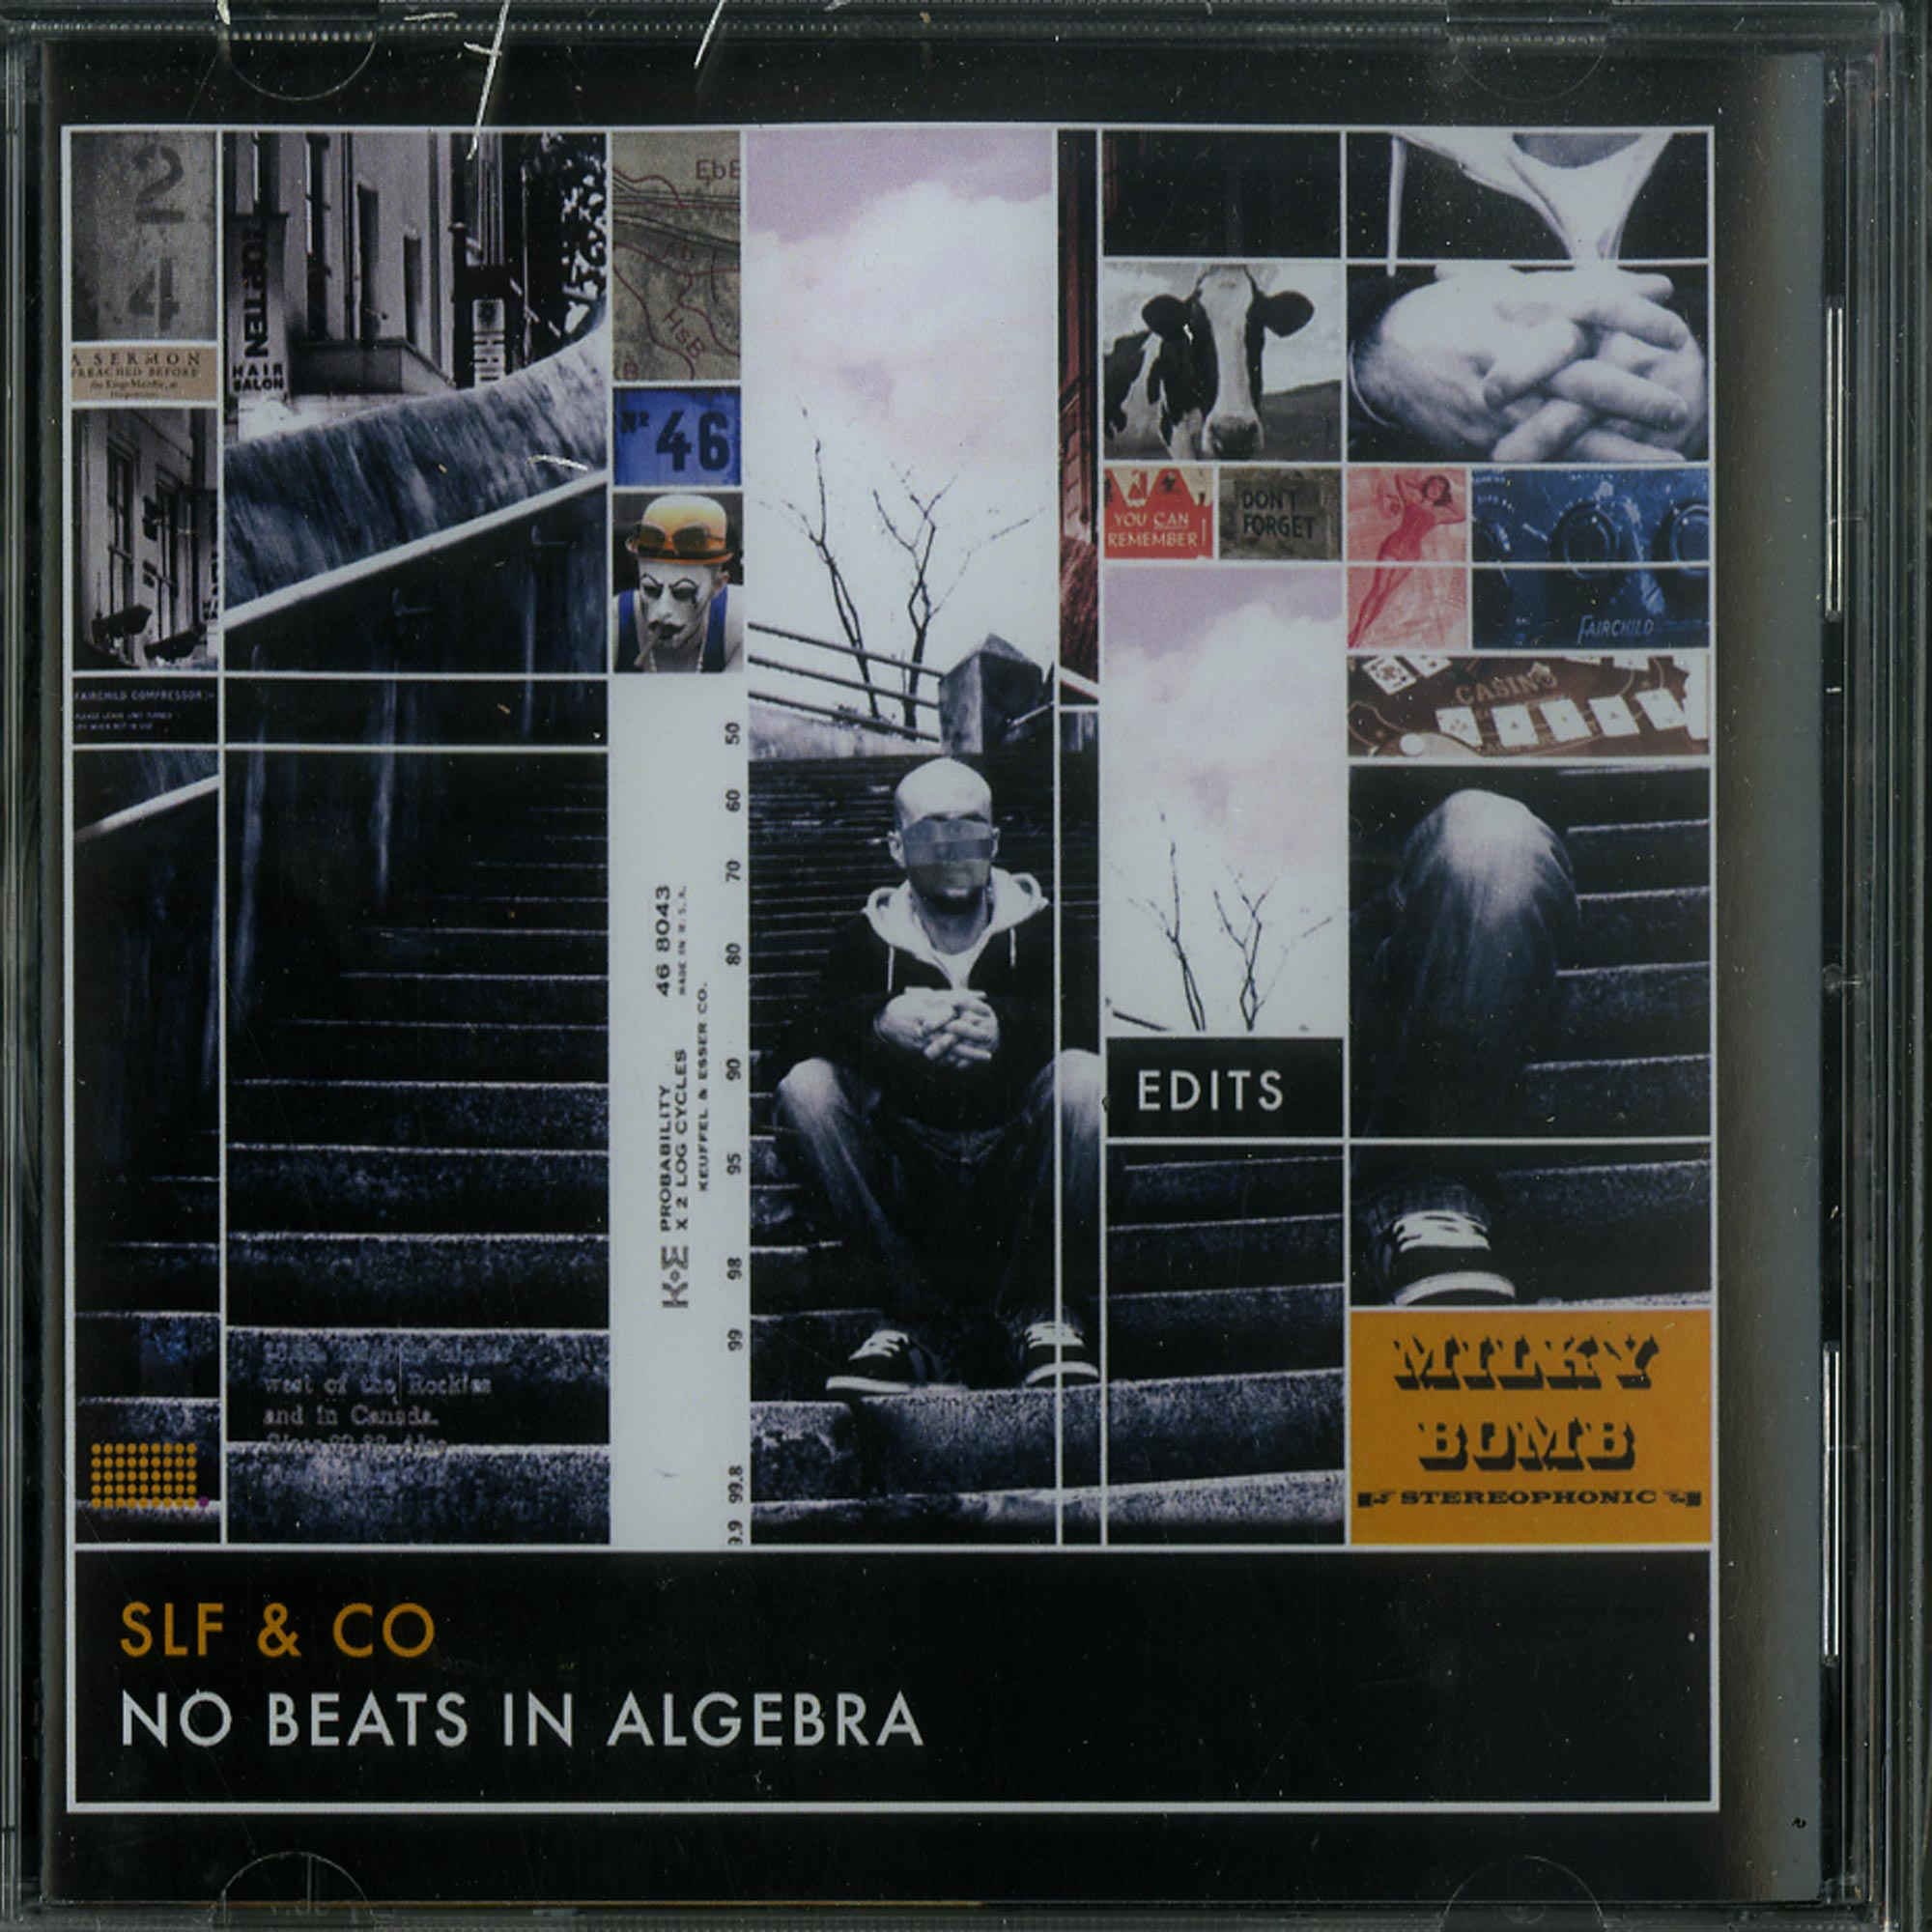 SLF&Co. - NO BEATS IN ALGEBRA